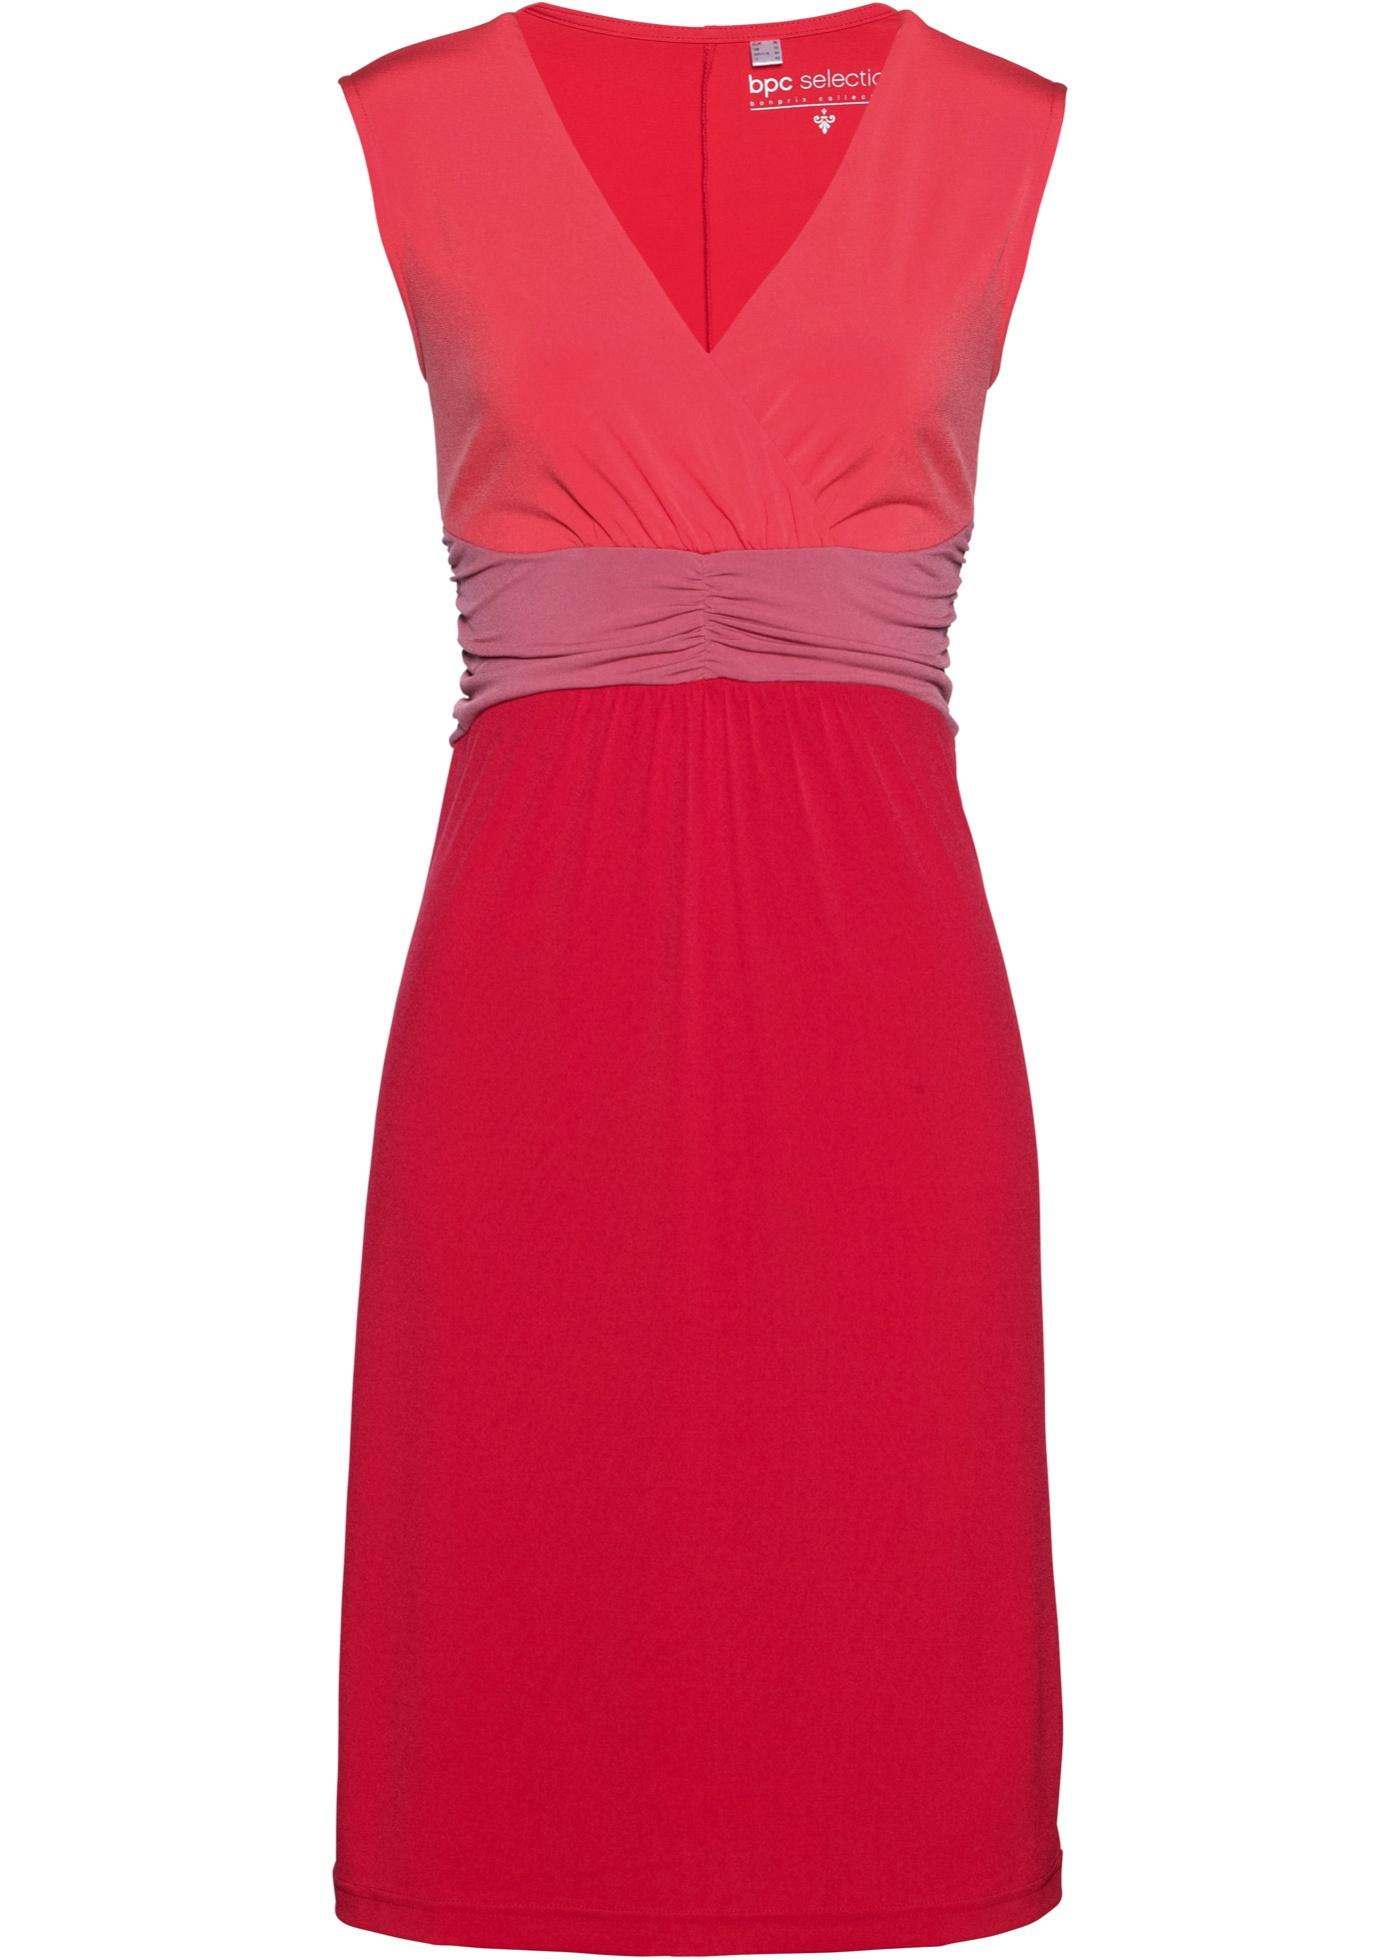 c0b06db73be2 Šaty z jemného úpletu - Červená